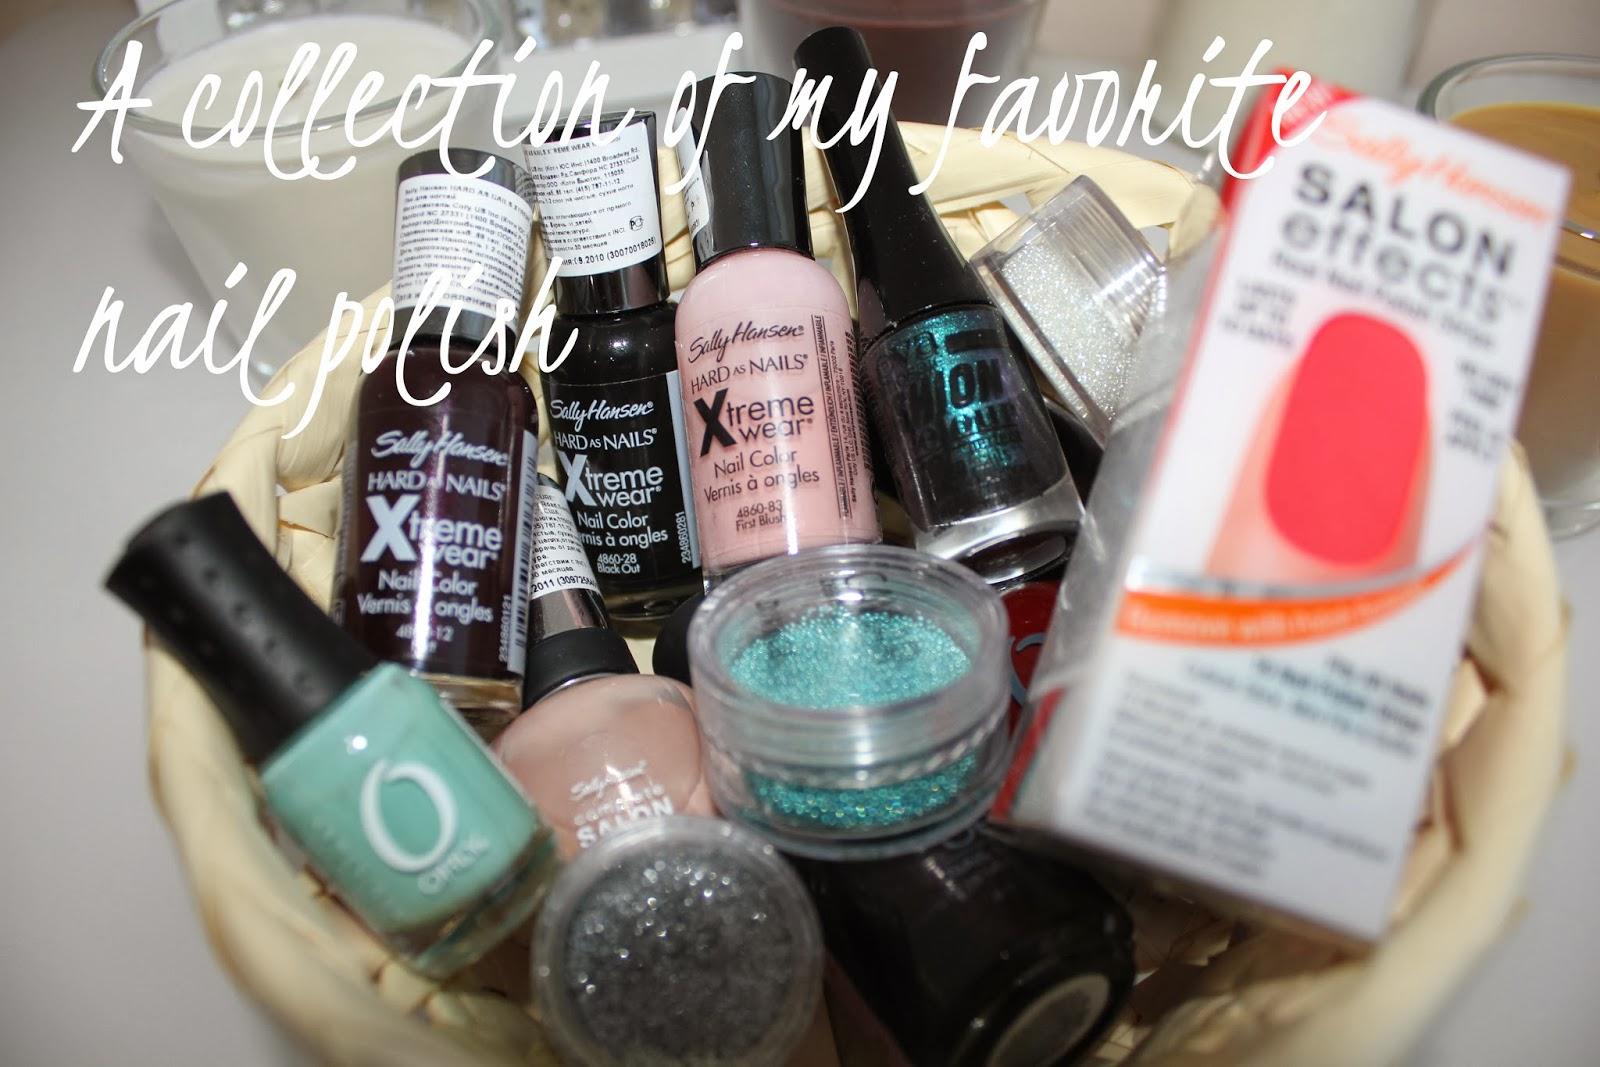 A collection of my favorite nail polish – Fashionlovin